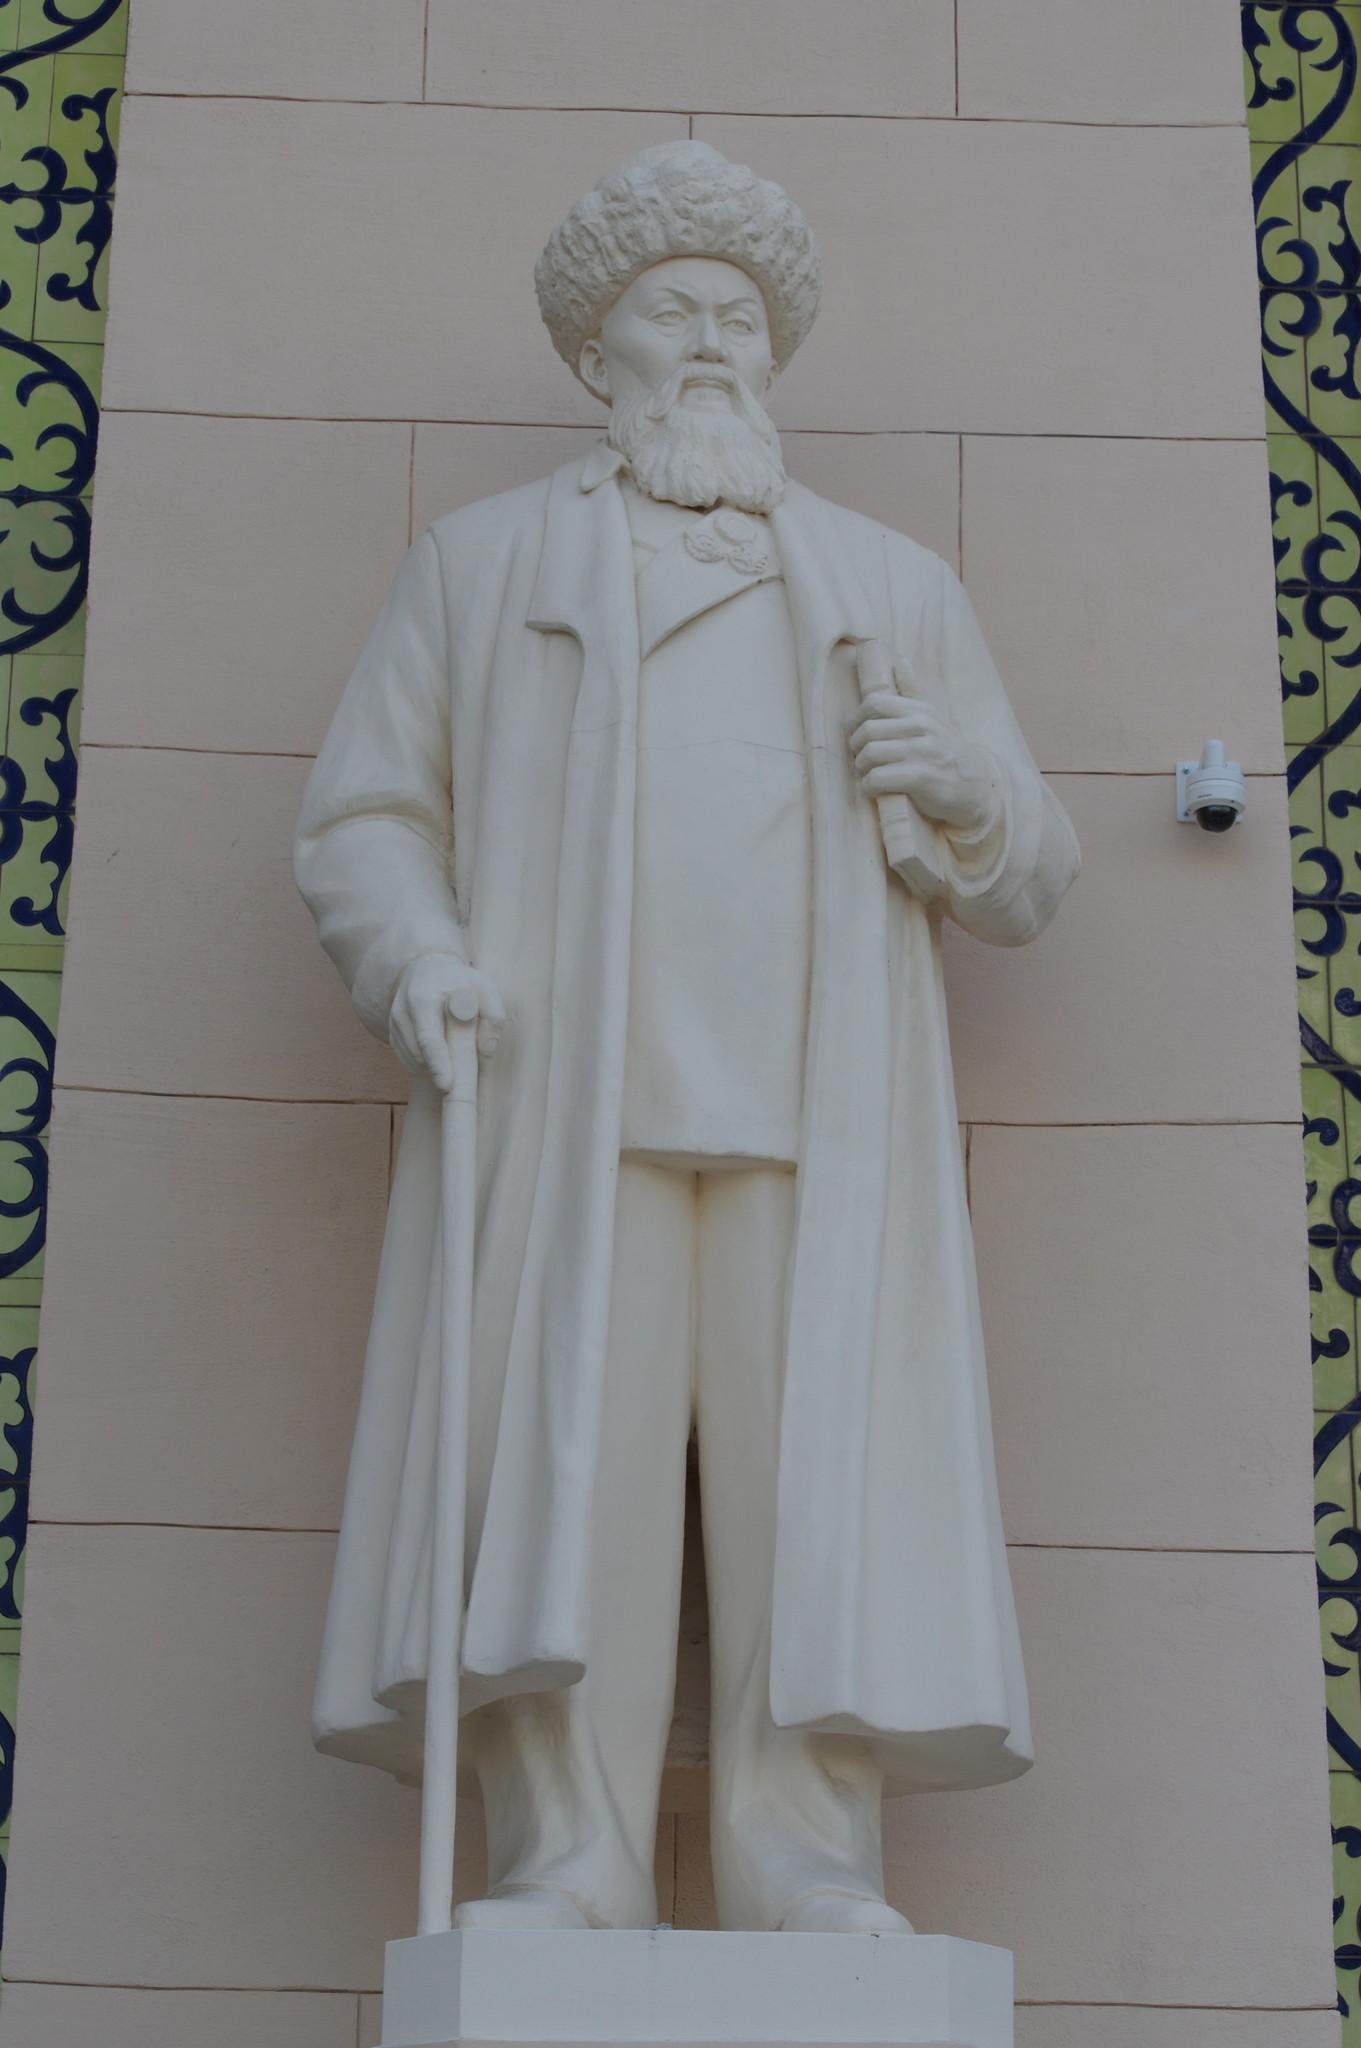 Скульптура казахского поэта Джамбула Джабаева. Павильон «Казахстан» на ВДНХ